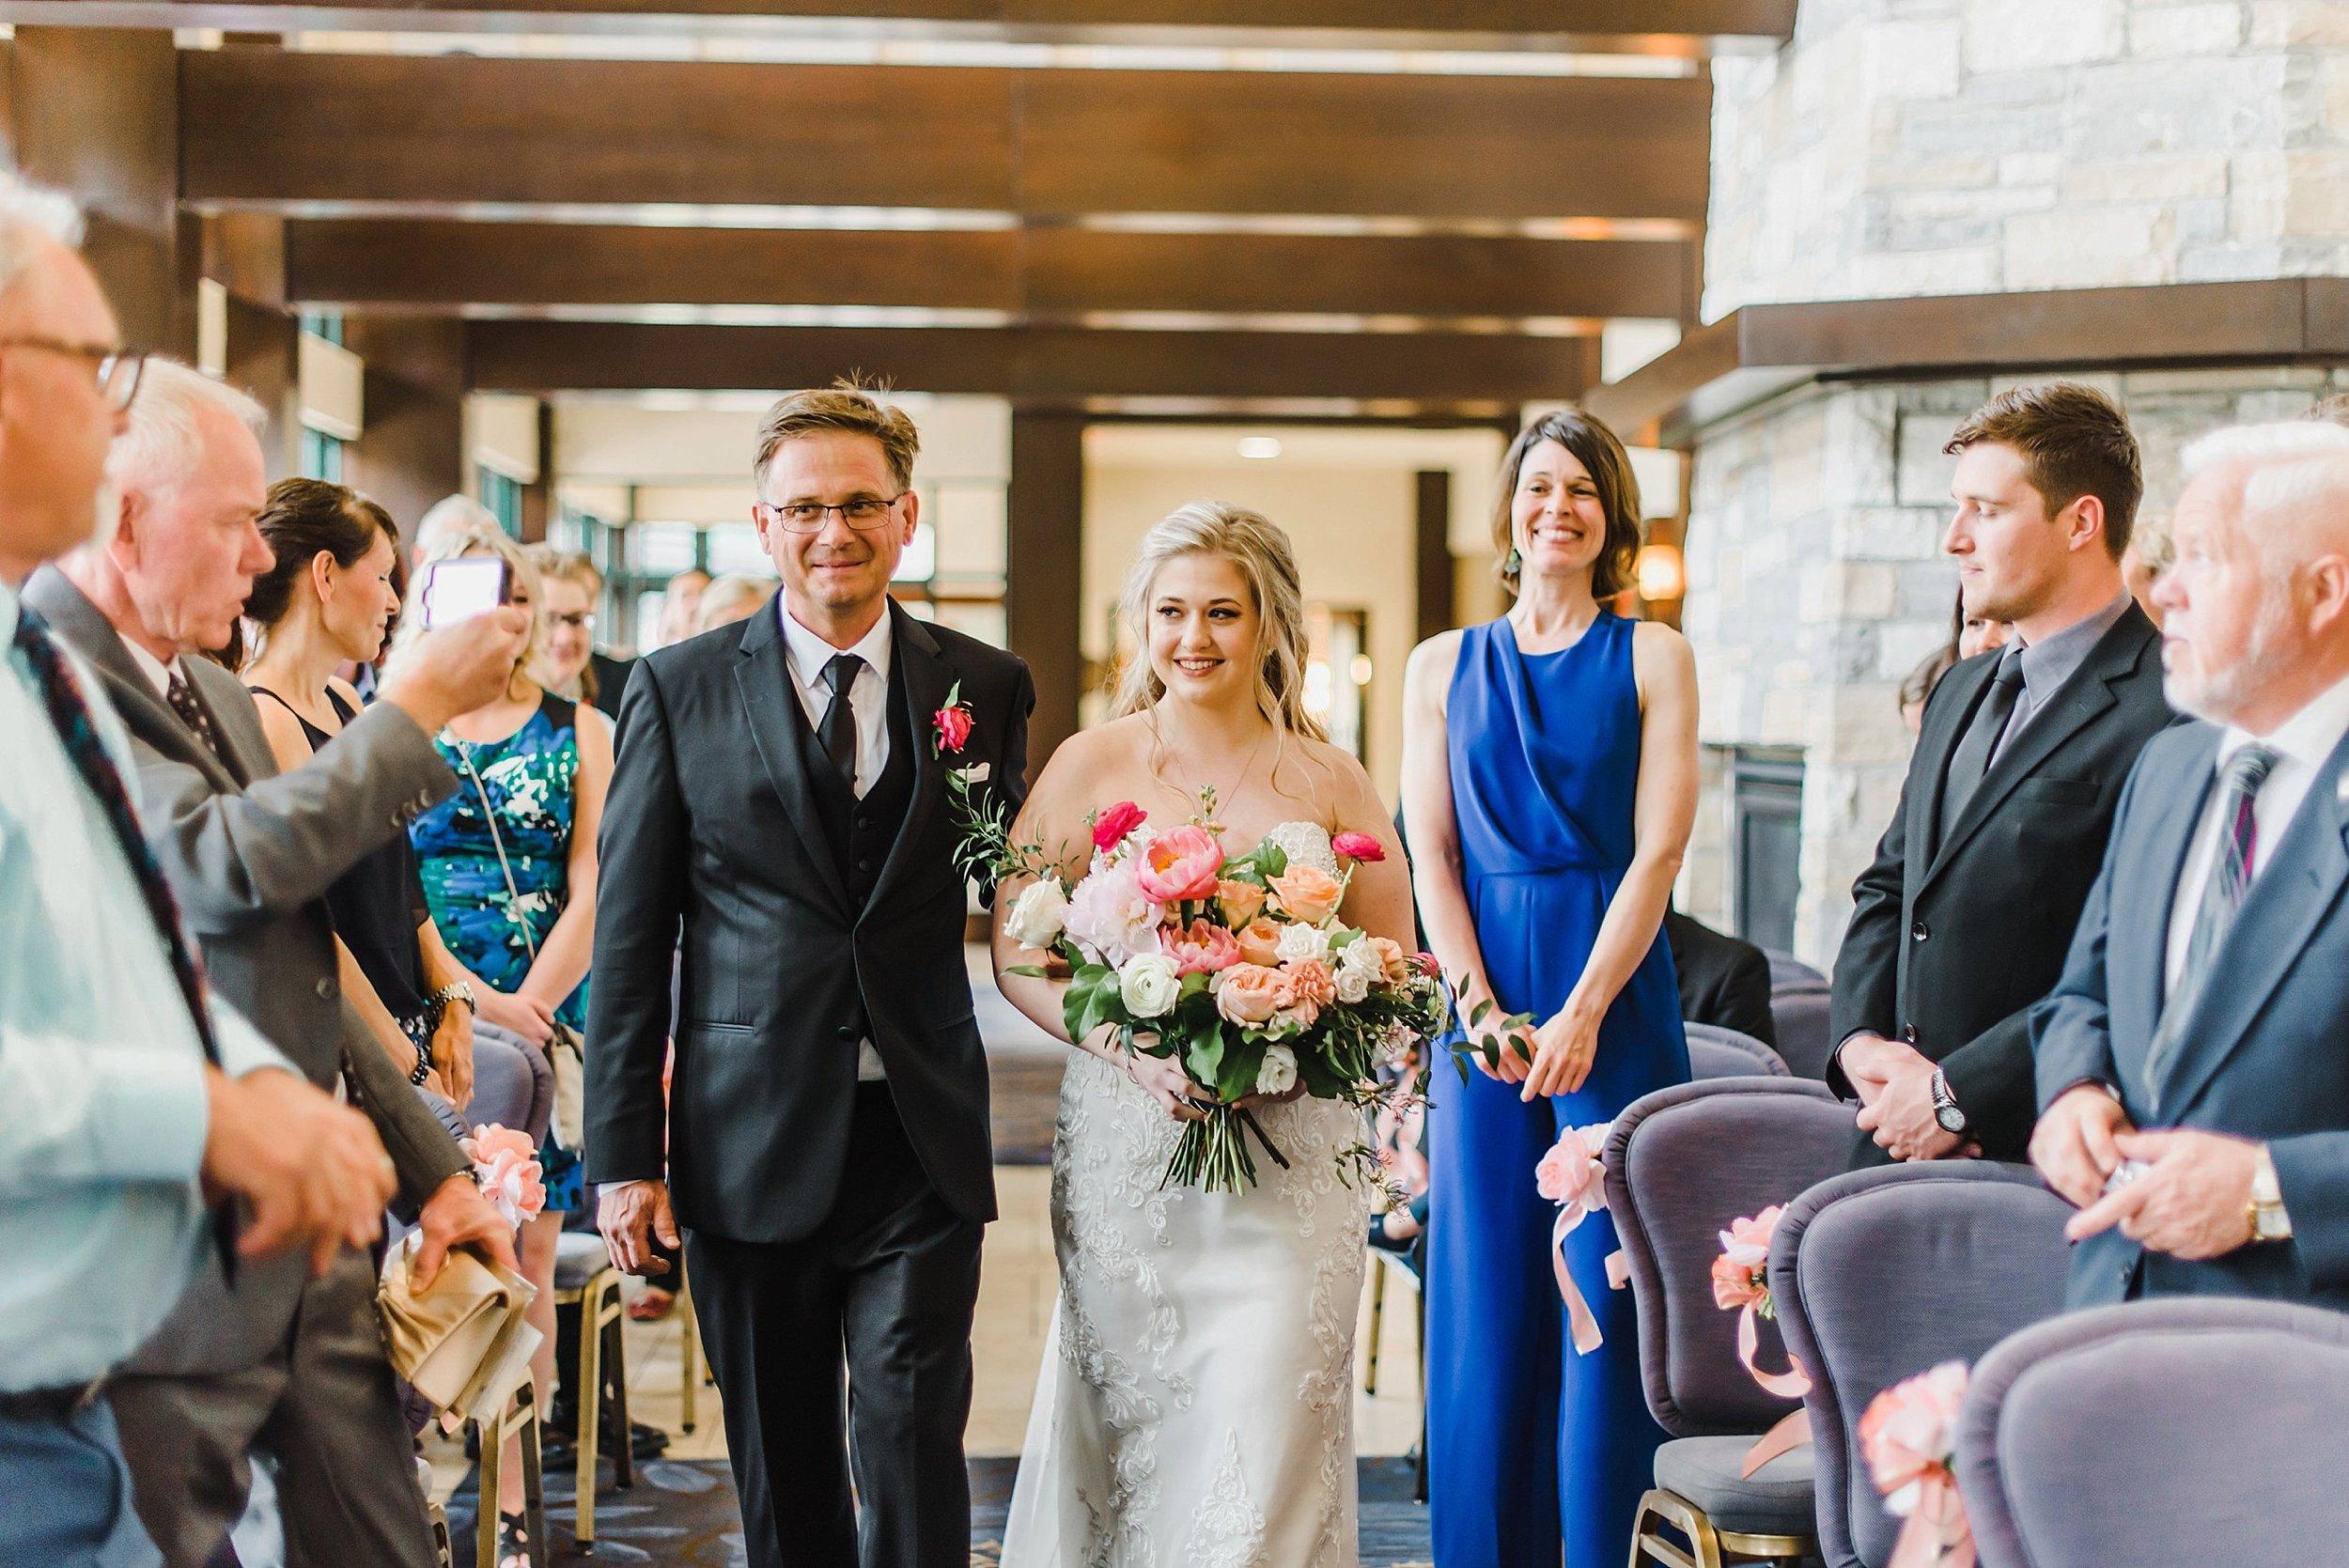 light airy indie fine art ottawa wedding photographer | Ali and Batoul Photography_0162.jpg